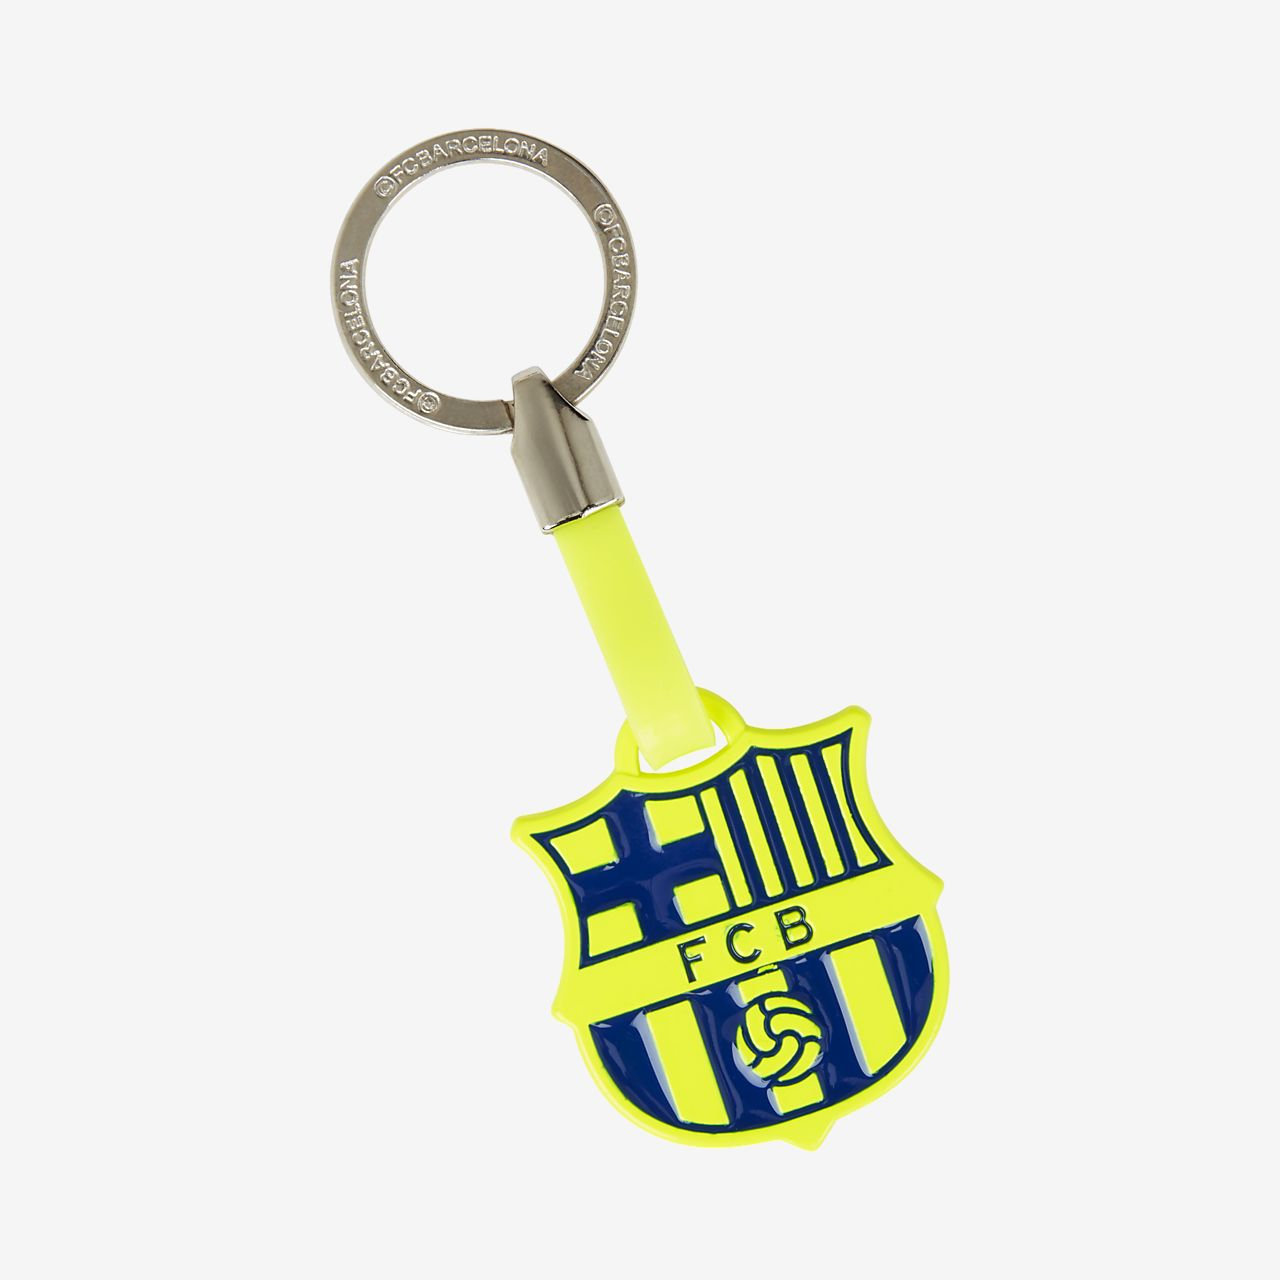 FC Barcelona Crest Schlüsselring